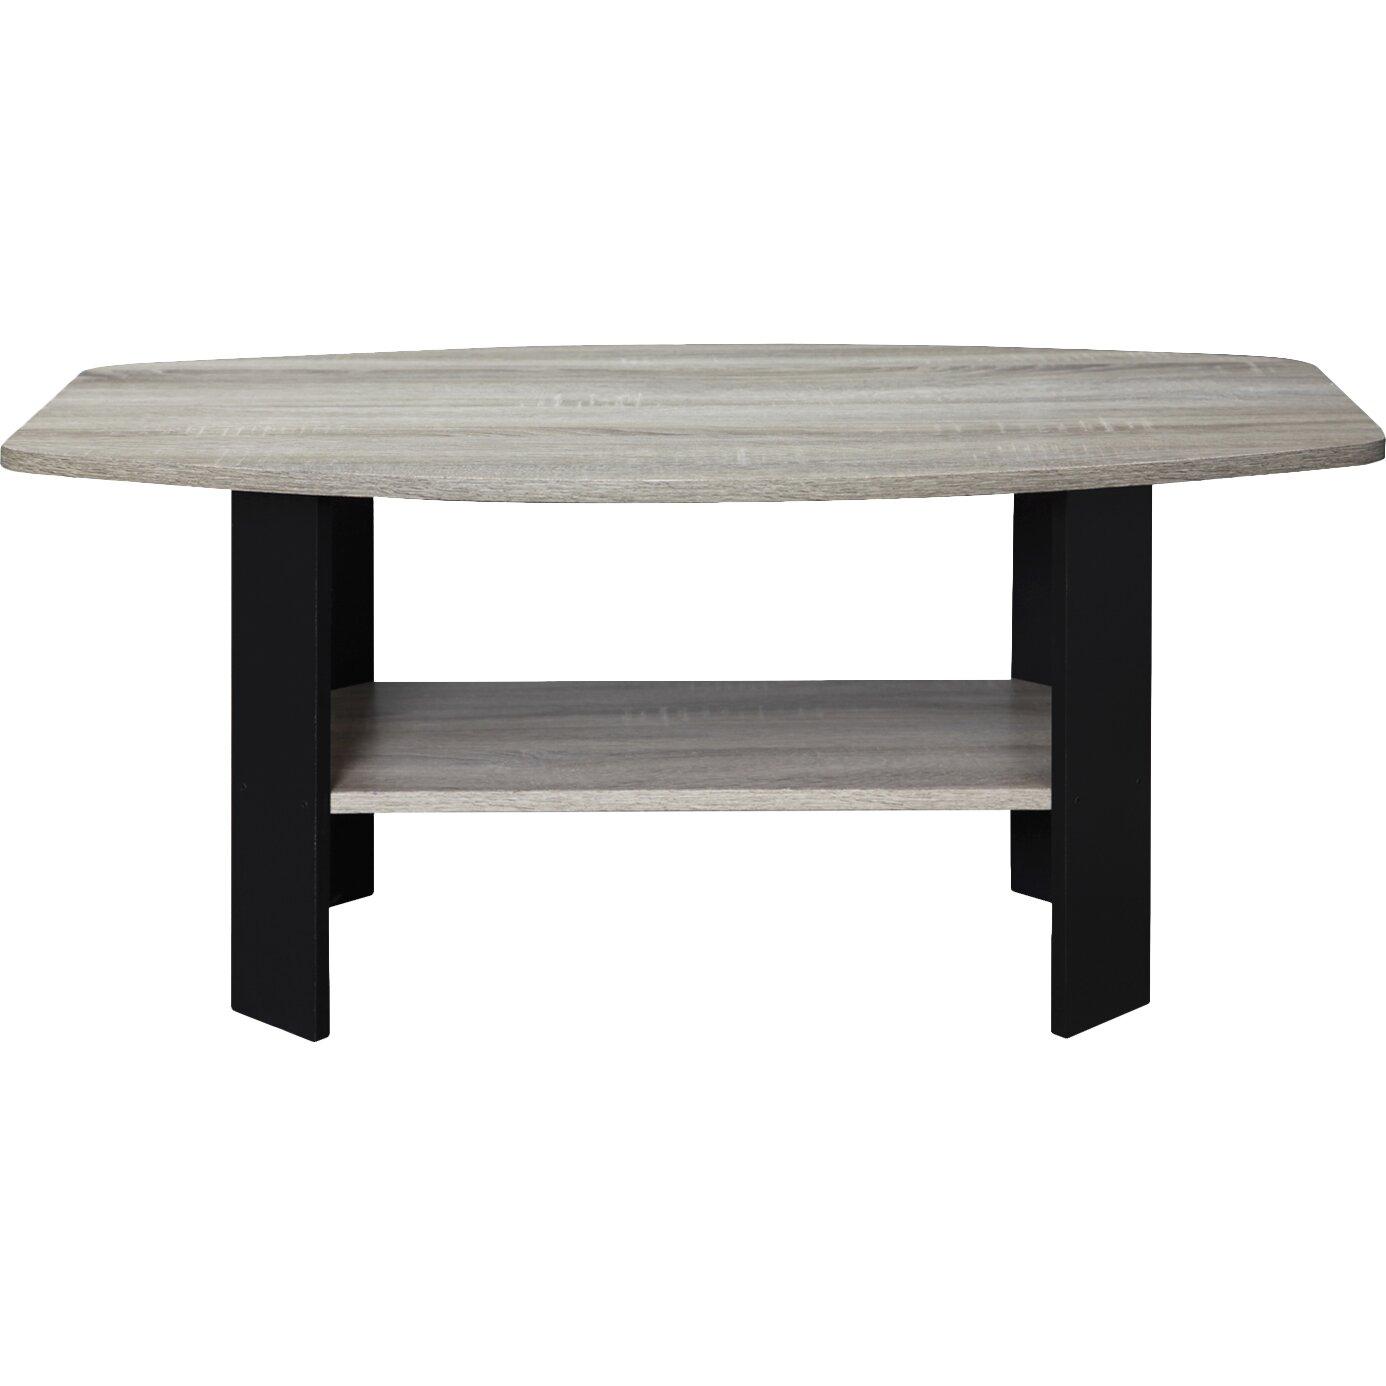 Furinno Simple Coffee Table Reviews Wayfair